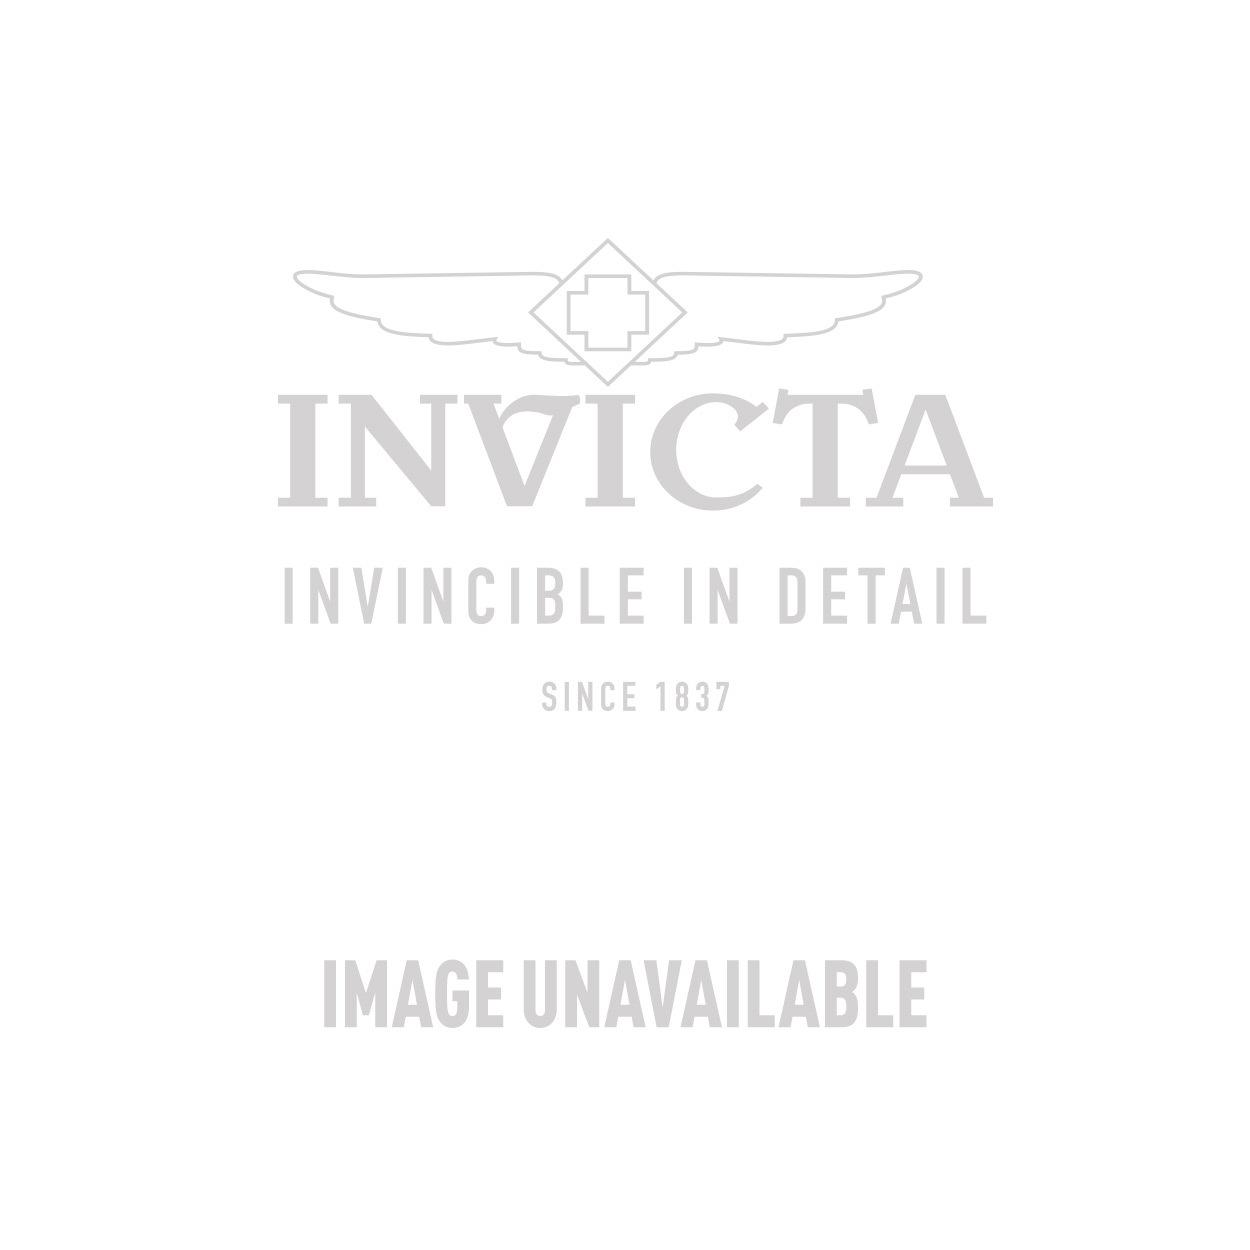 Invicta Pro Diver Quartz Watch - Gold, Stainless Steel case with Steel, Gold tone Stainless Steel band - Model 1773